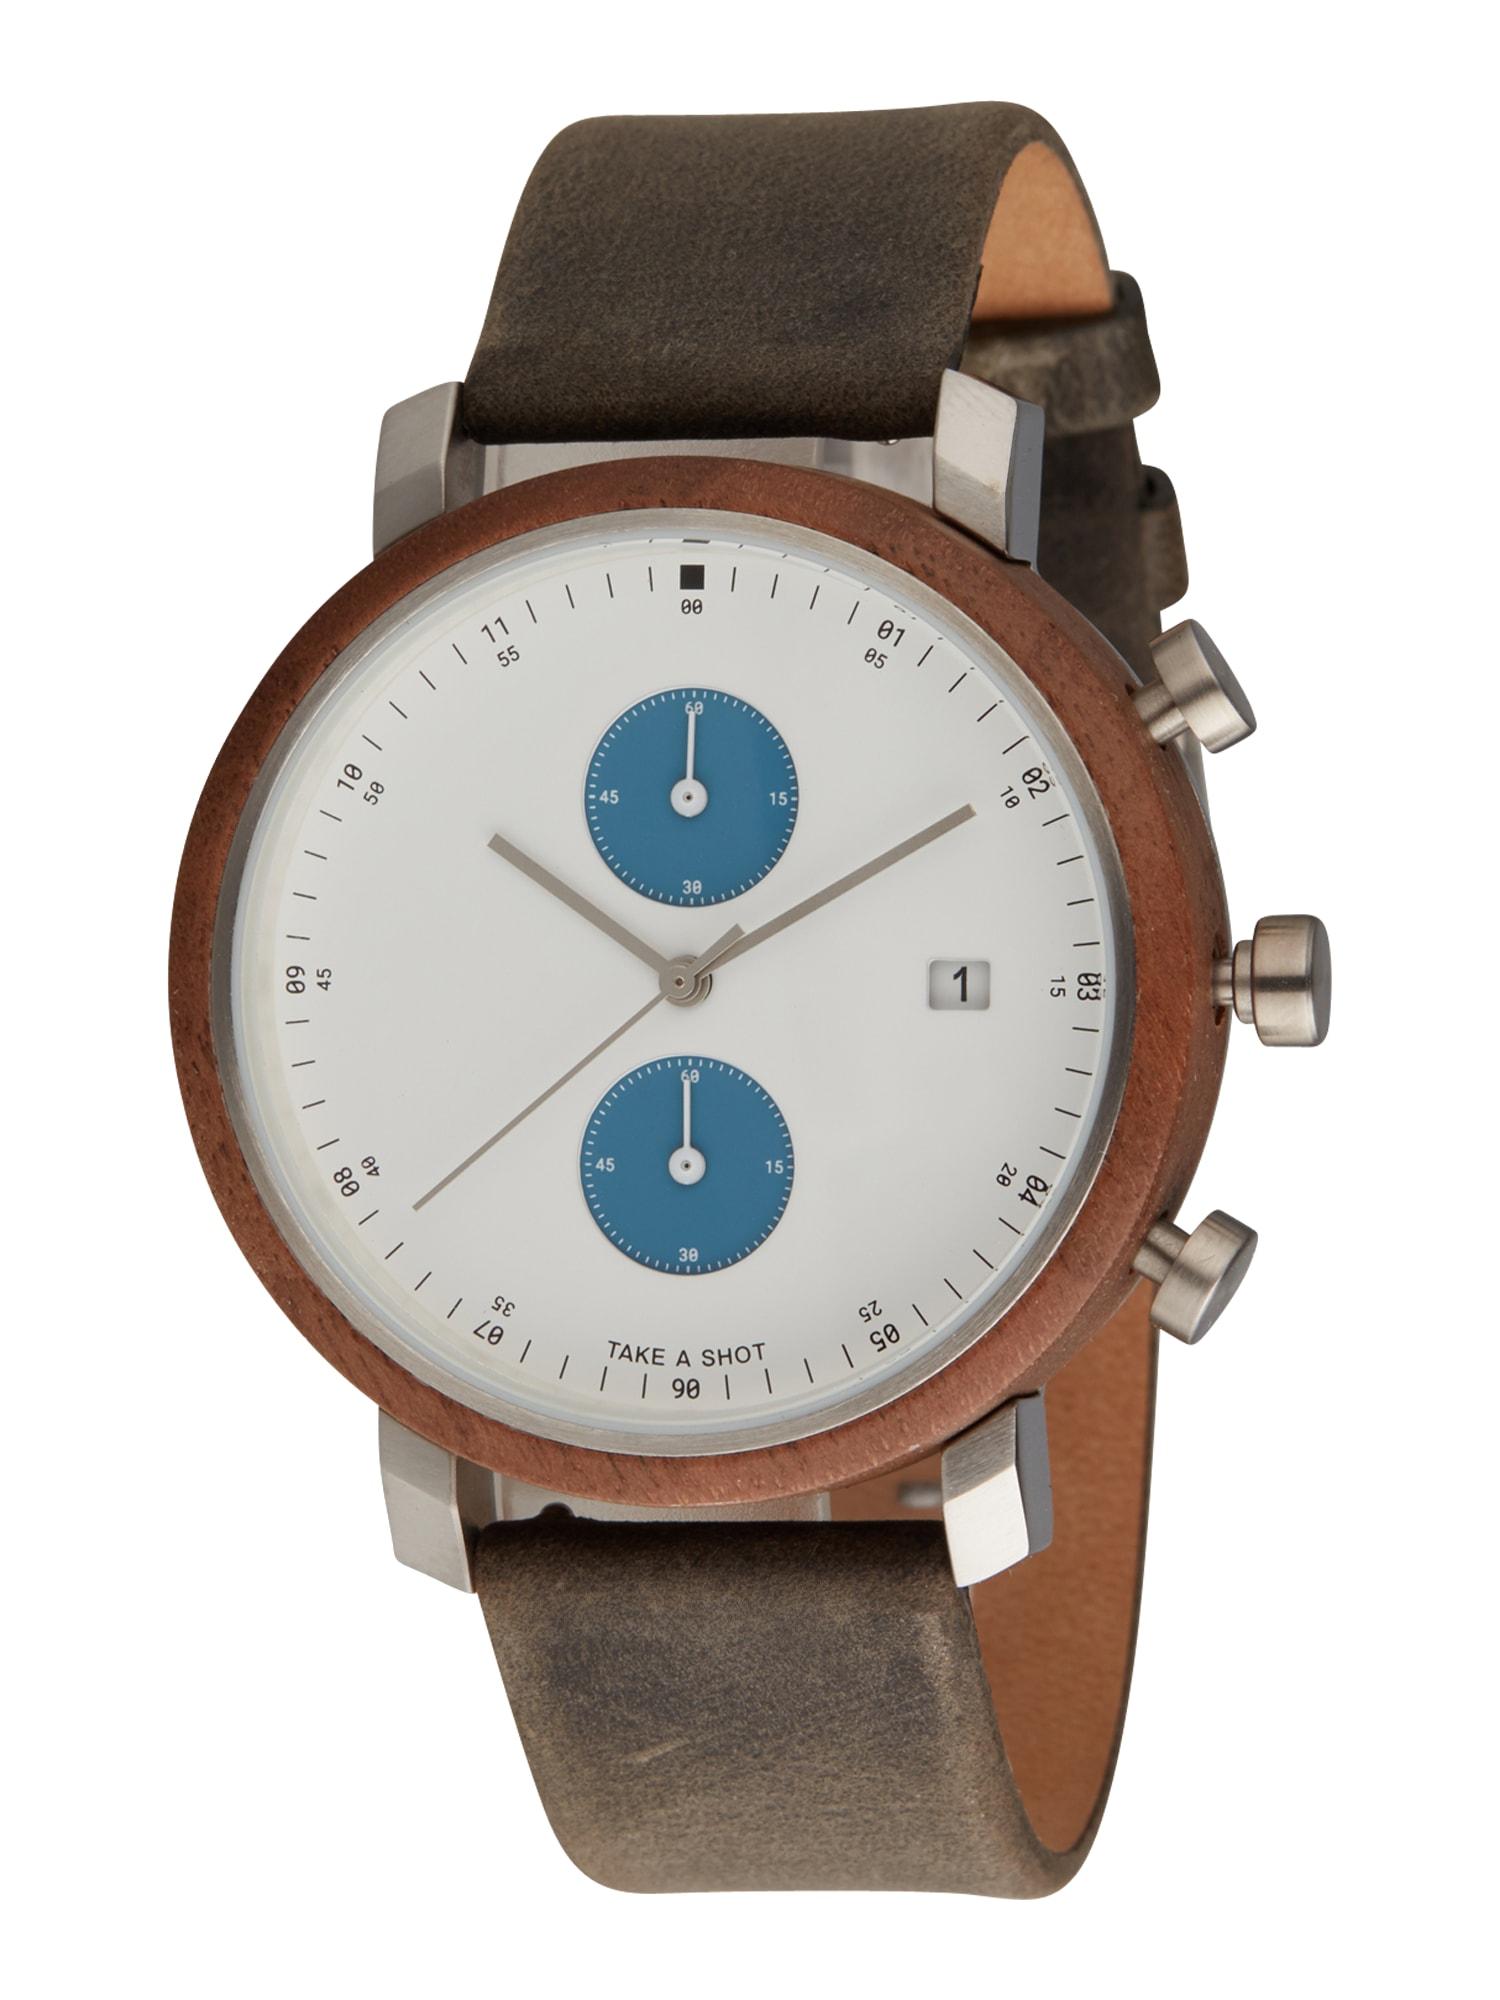 TAKE A SHOT Analoginis (įprastinio dizaino) laikrodis 'Humphrey' ruda